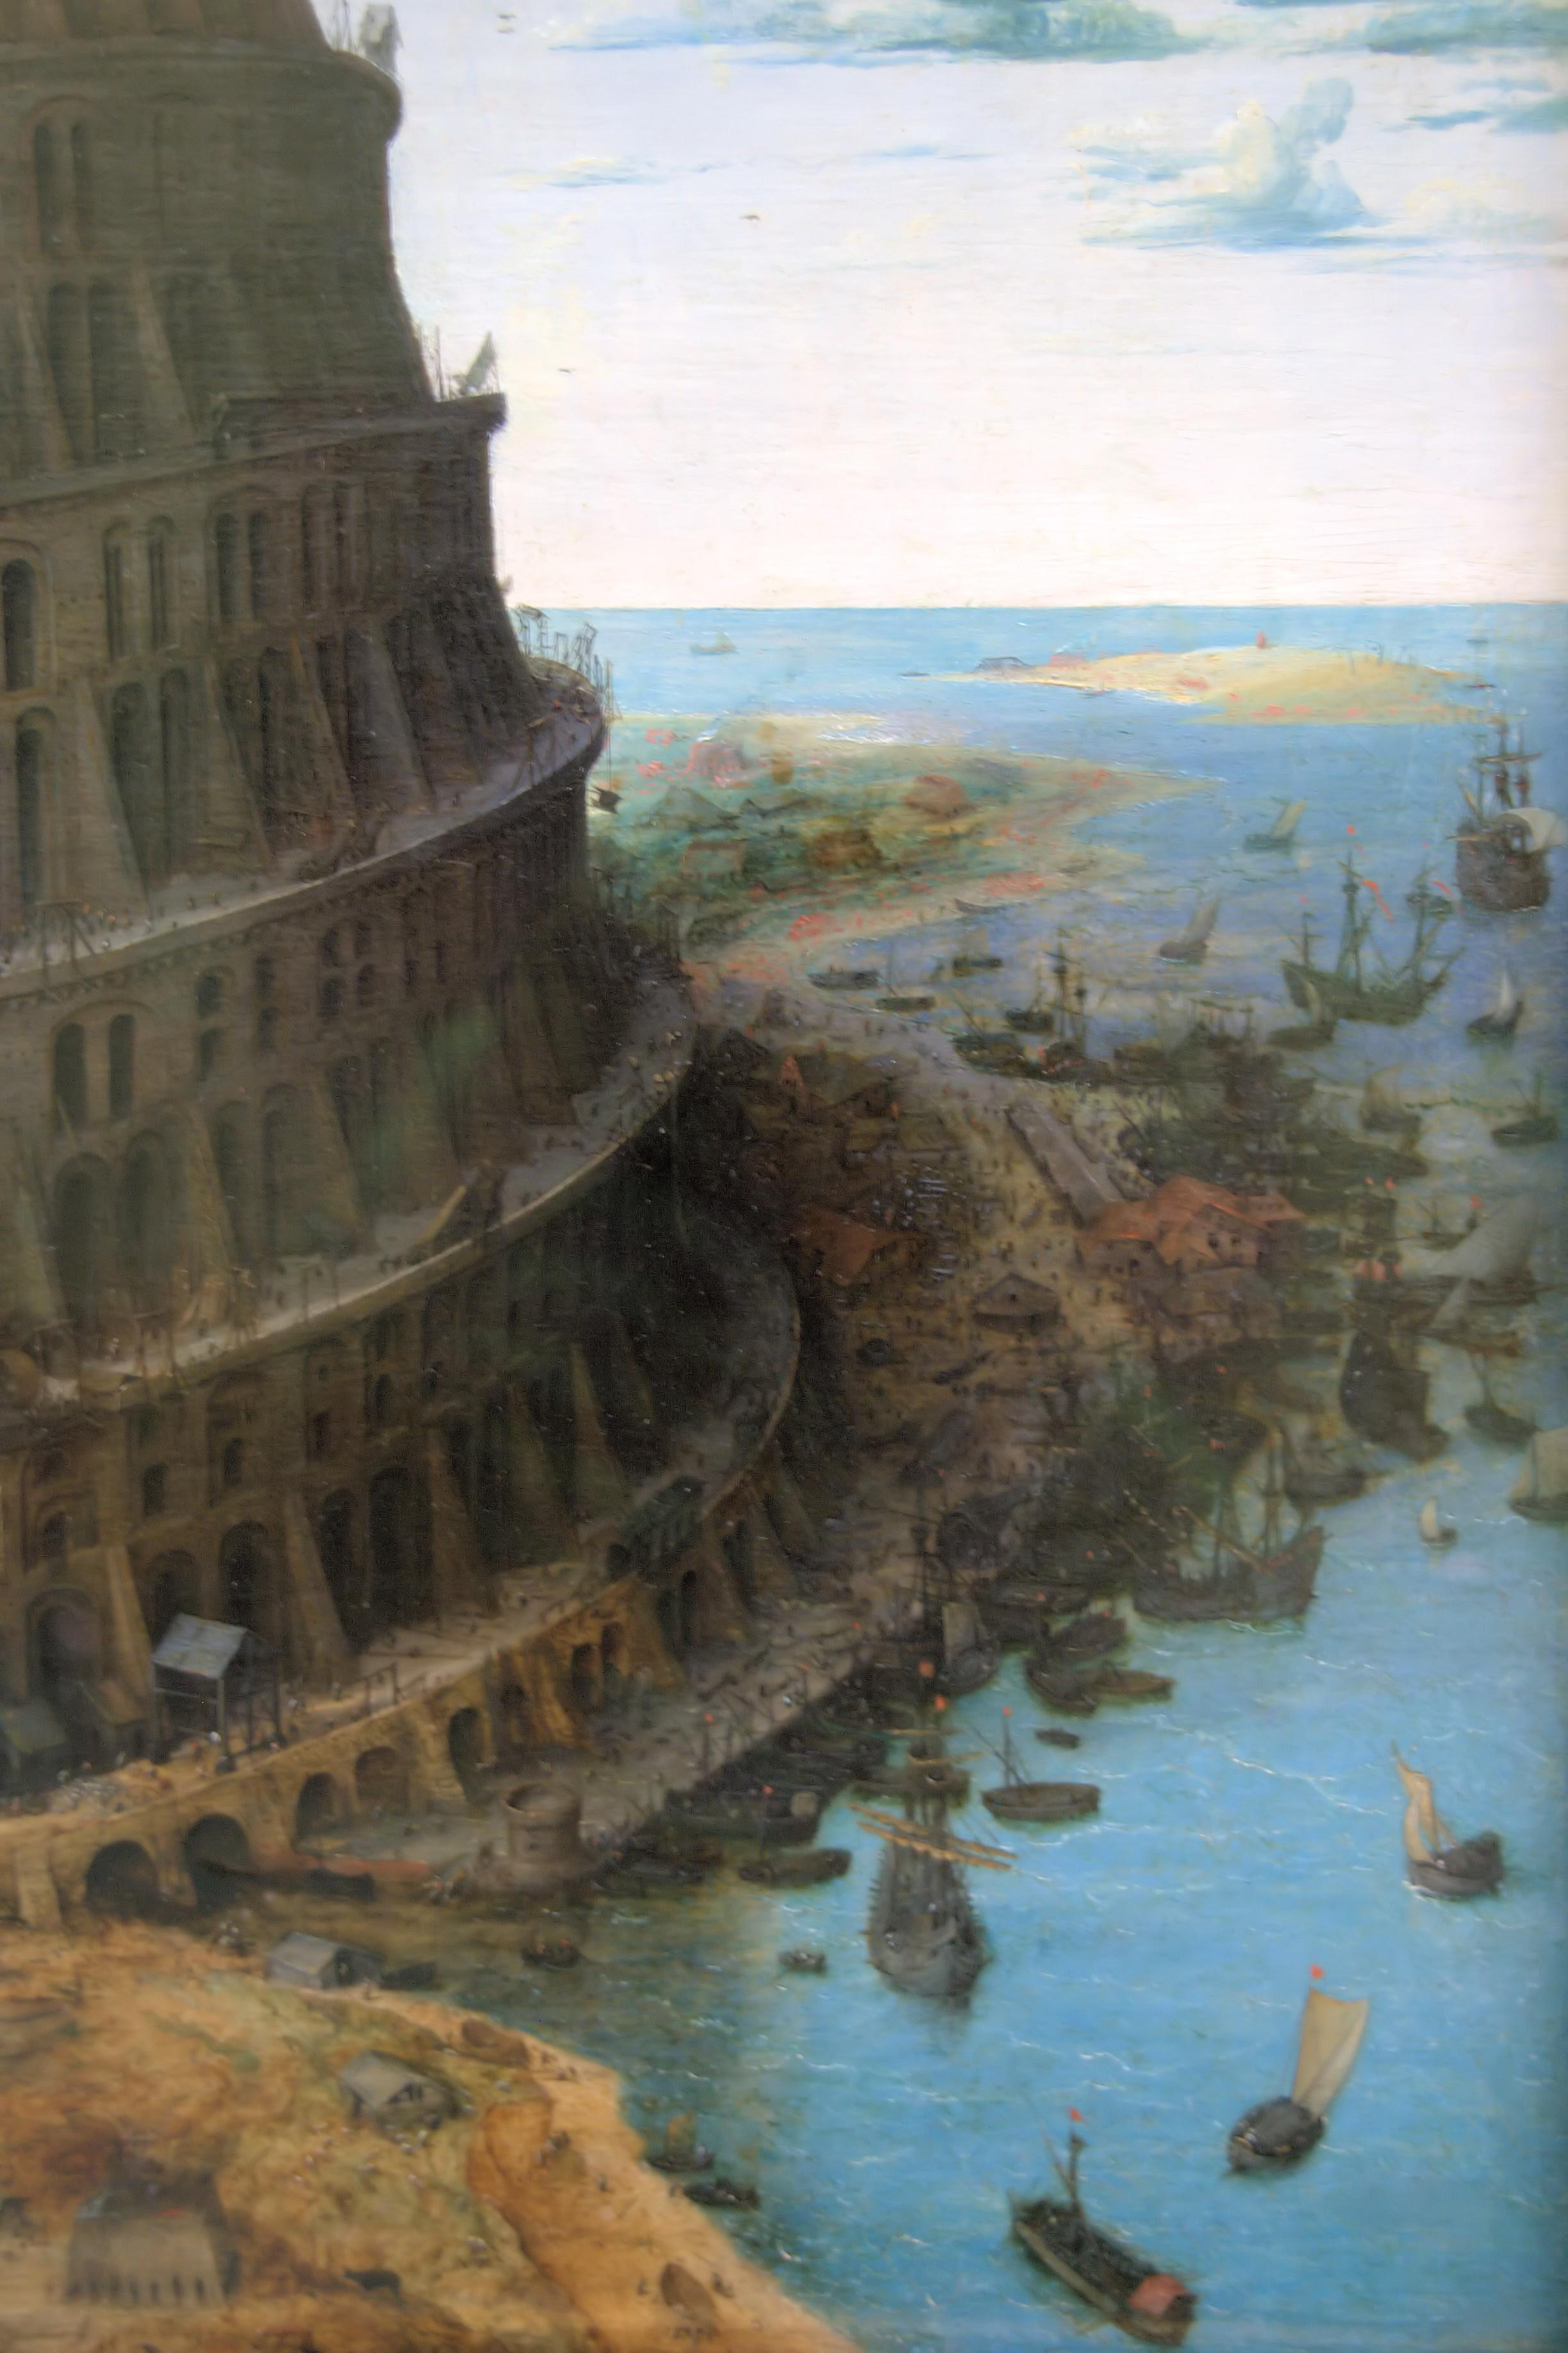 http://upload.wikimedia.org/wikipedia/commons/e/e6/WLANL_-_Quistnix%21_-_Museum_Boijmans_van_Beuningen_-_Toren_van_Babel%2C_Bruegel_-_detail.jpg